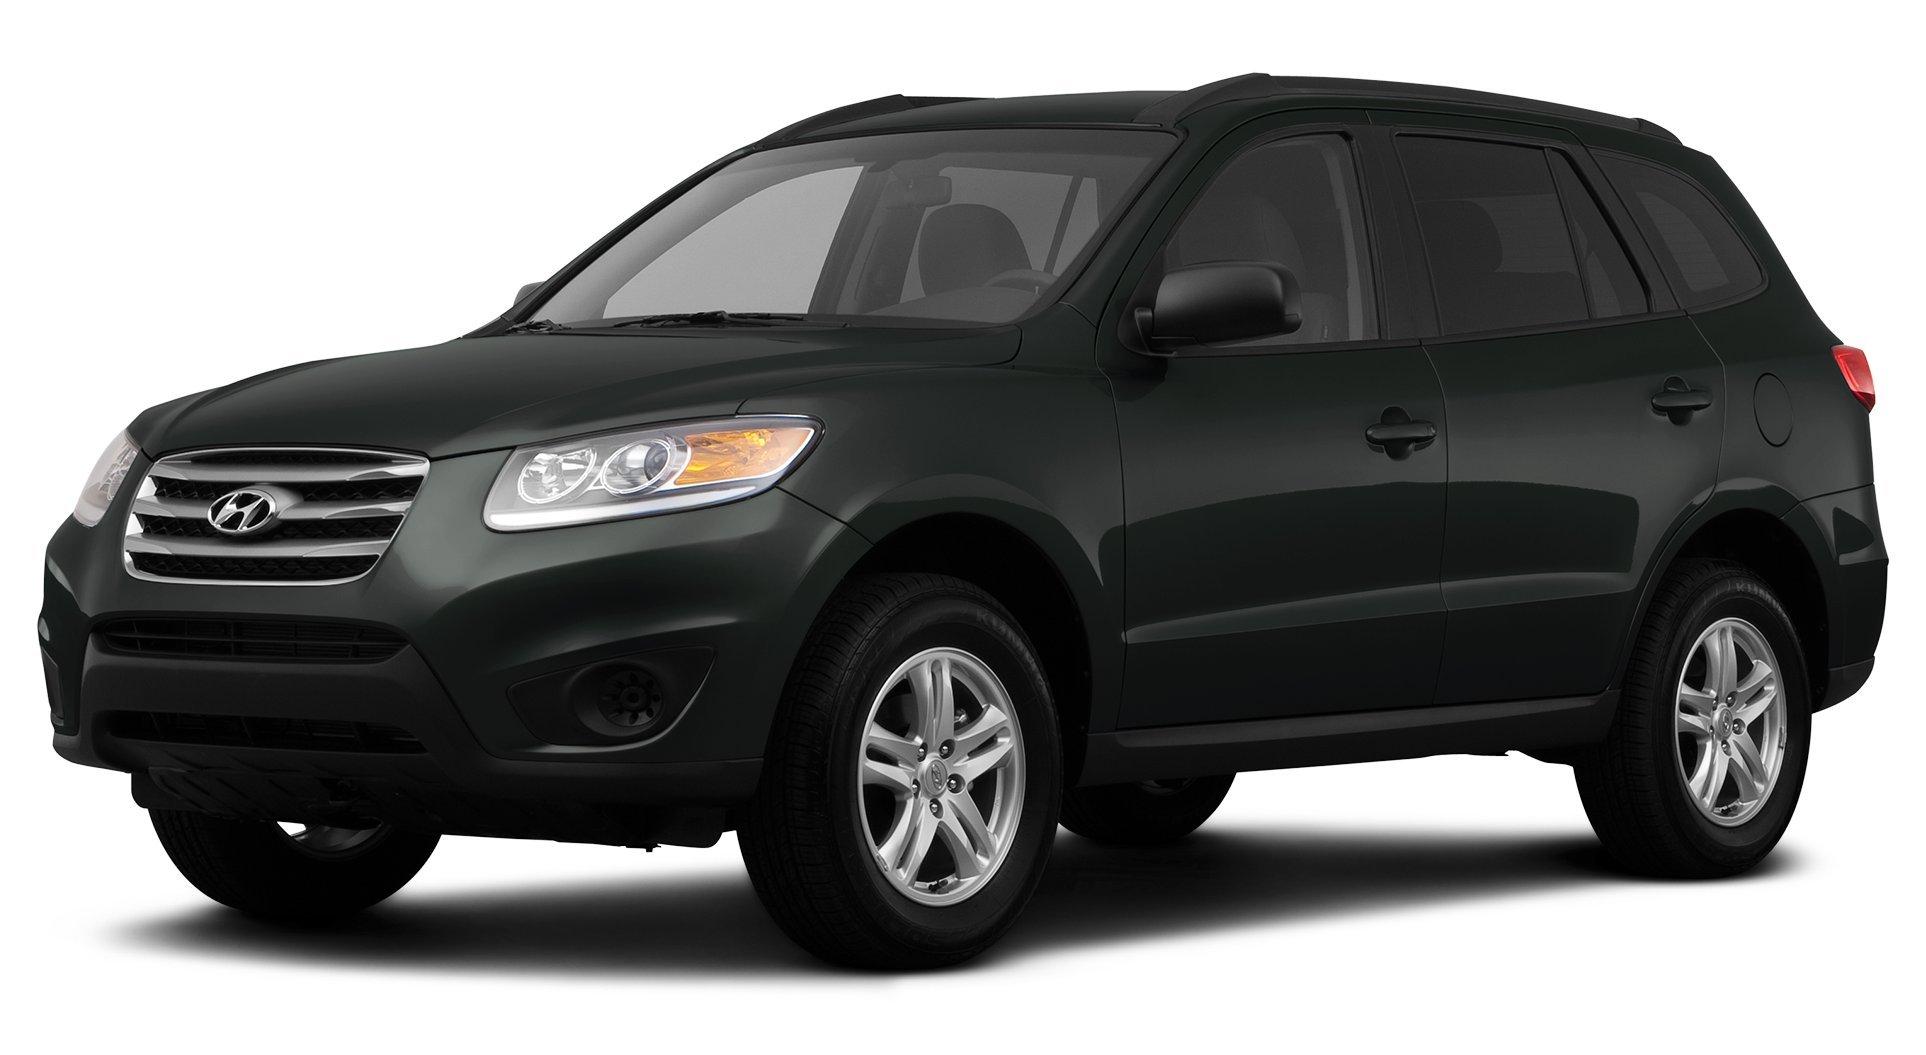 2012 Hyundai Santa Fe Gls All Wheel Drive  Cylinder